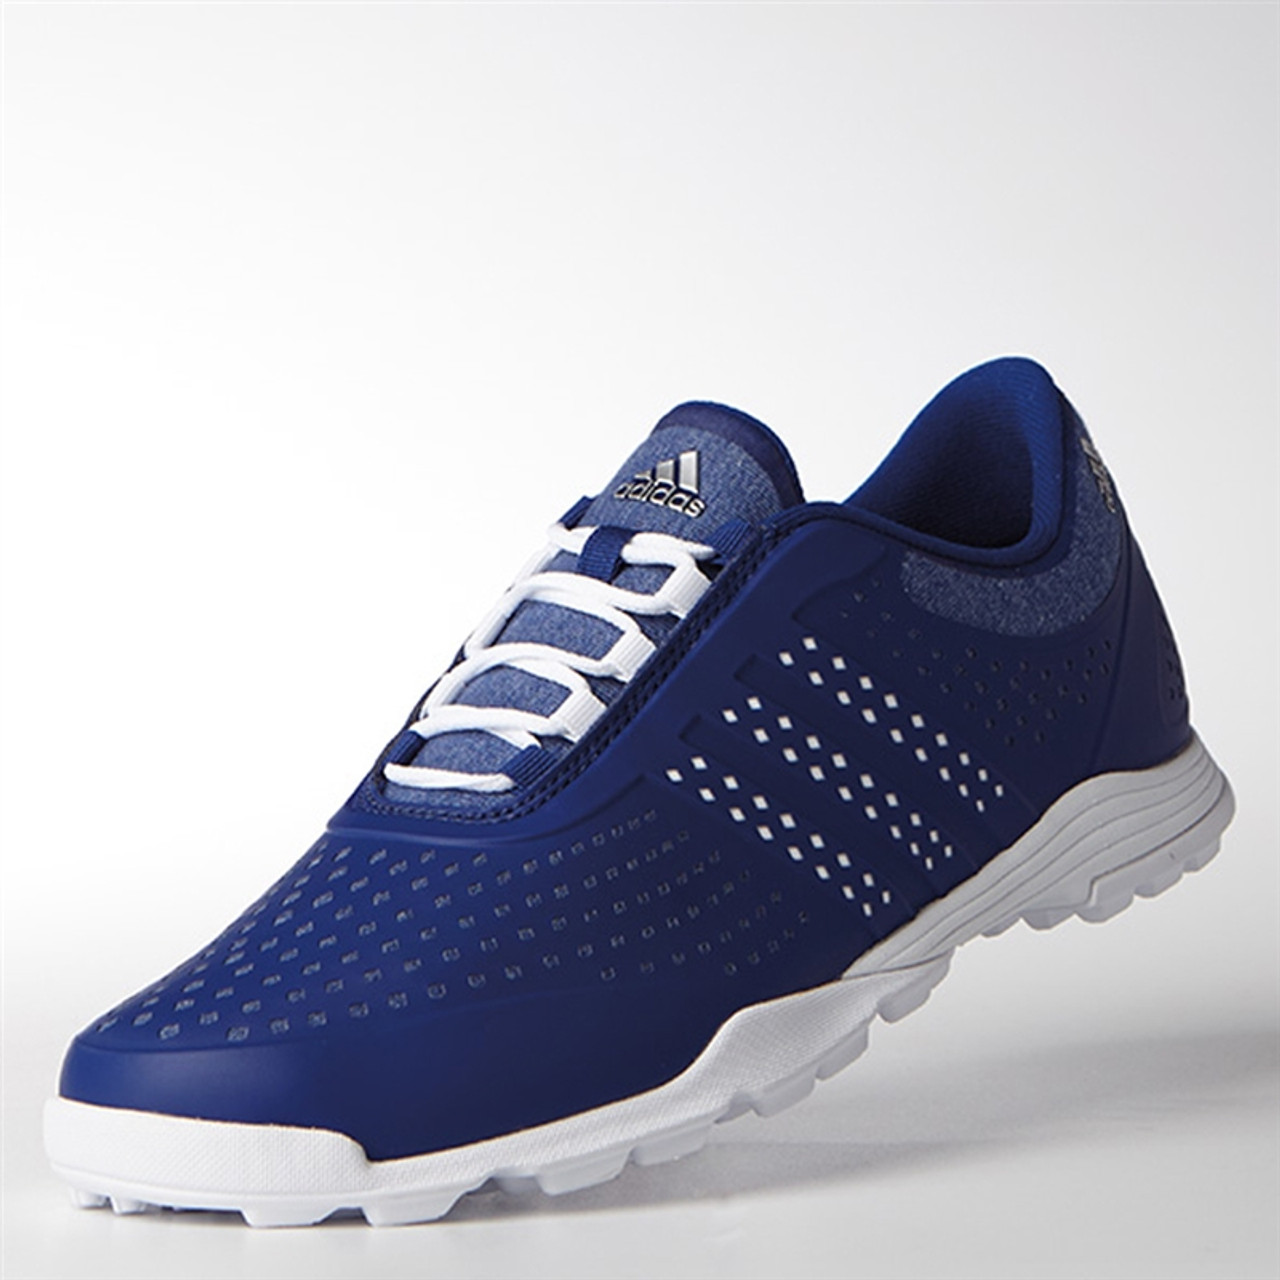 best loved 9bf9d 2d872 Adidas Adipure Sport Golf Shoe - Mystery InkWhite  Golf4Her